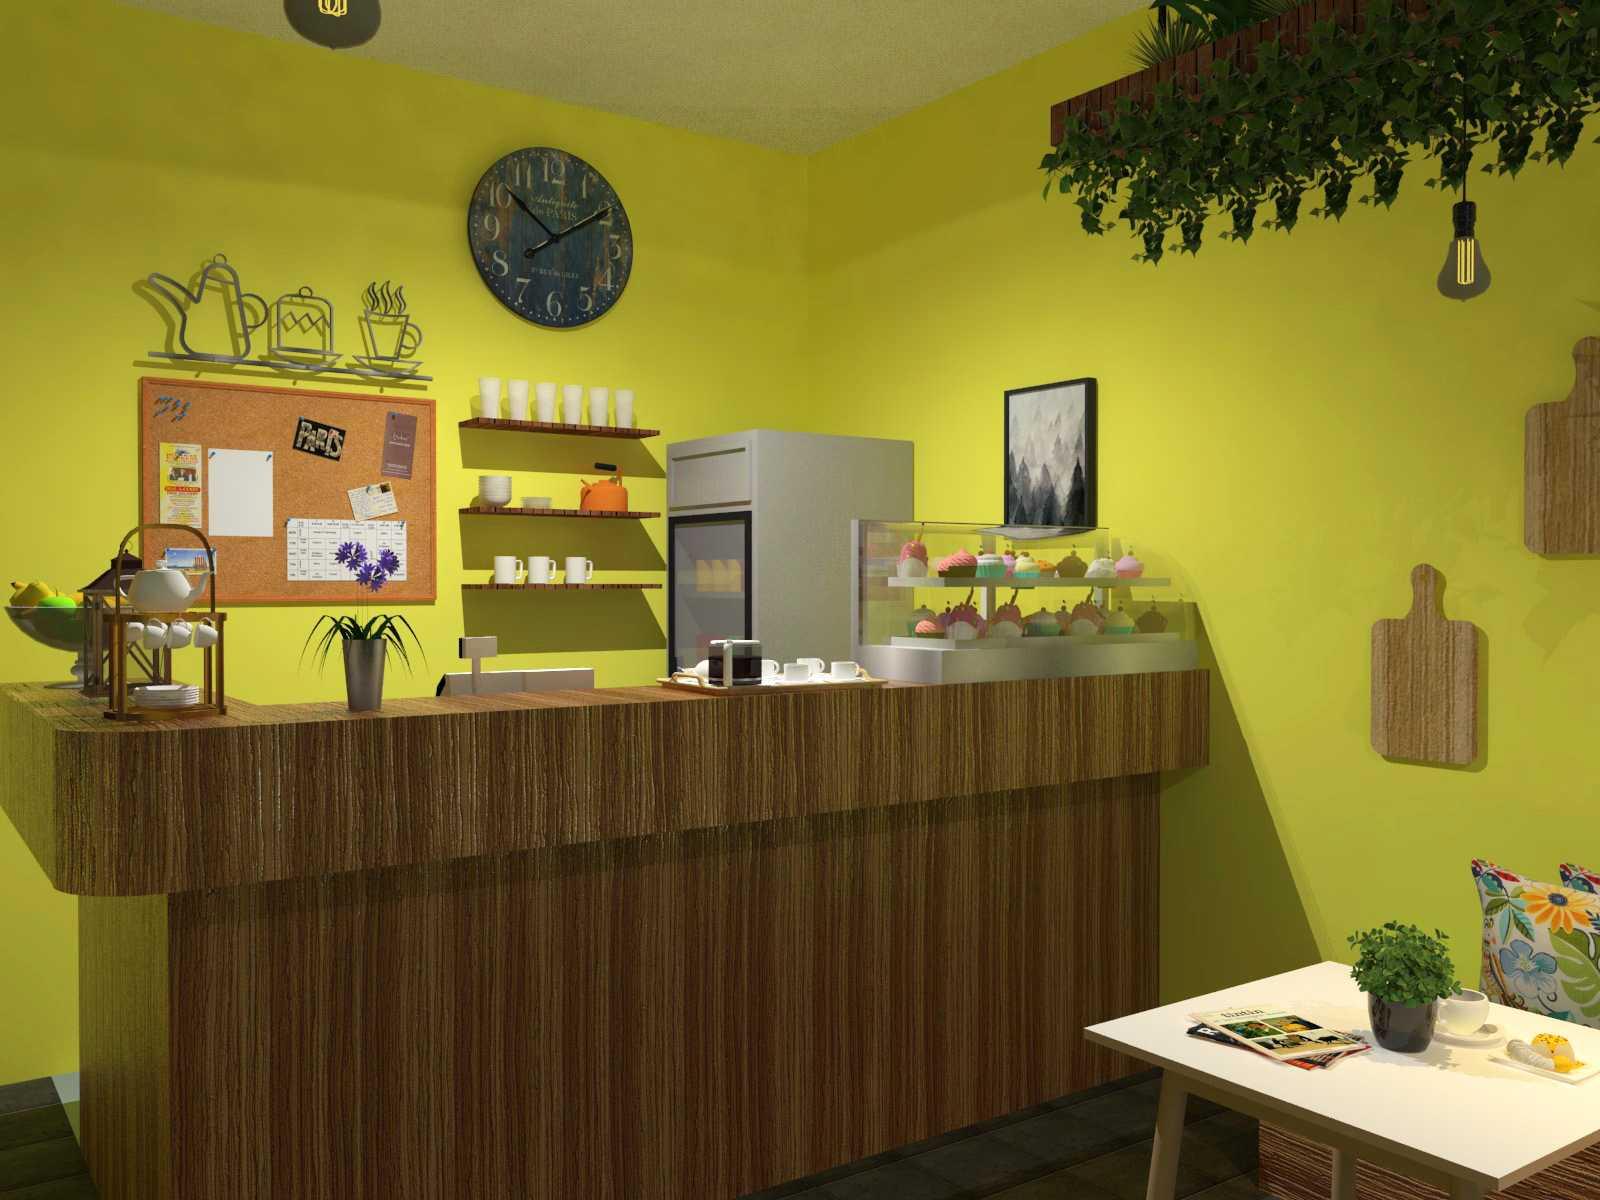 San.id Studio Alle's Cafe And Pastry Samarinda, Kota Samarinda, Kalimantan Timur, Indonesia Samarinda, Kota Samarinda, Kalimantan Timur, Indonesia Sanid-Studio-Alles-Cafe-And-Pastry  57973